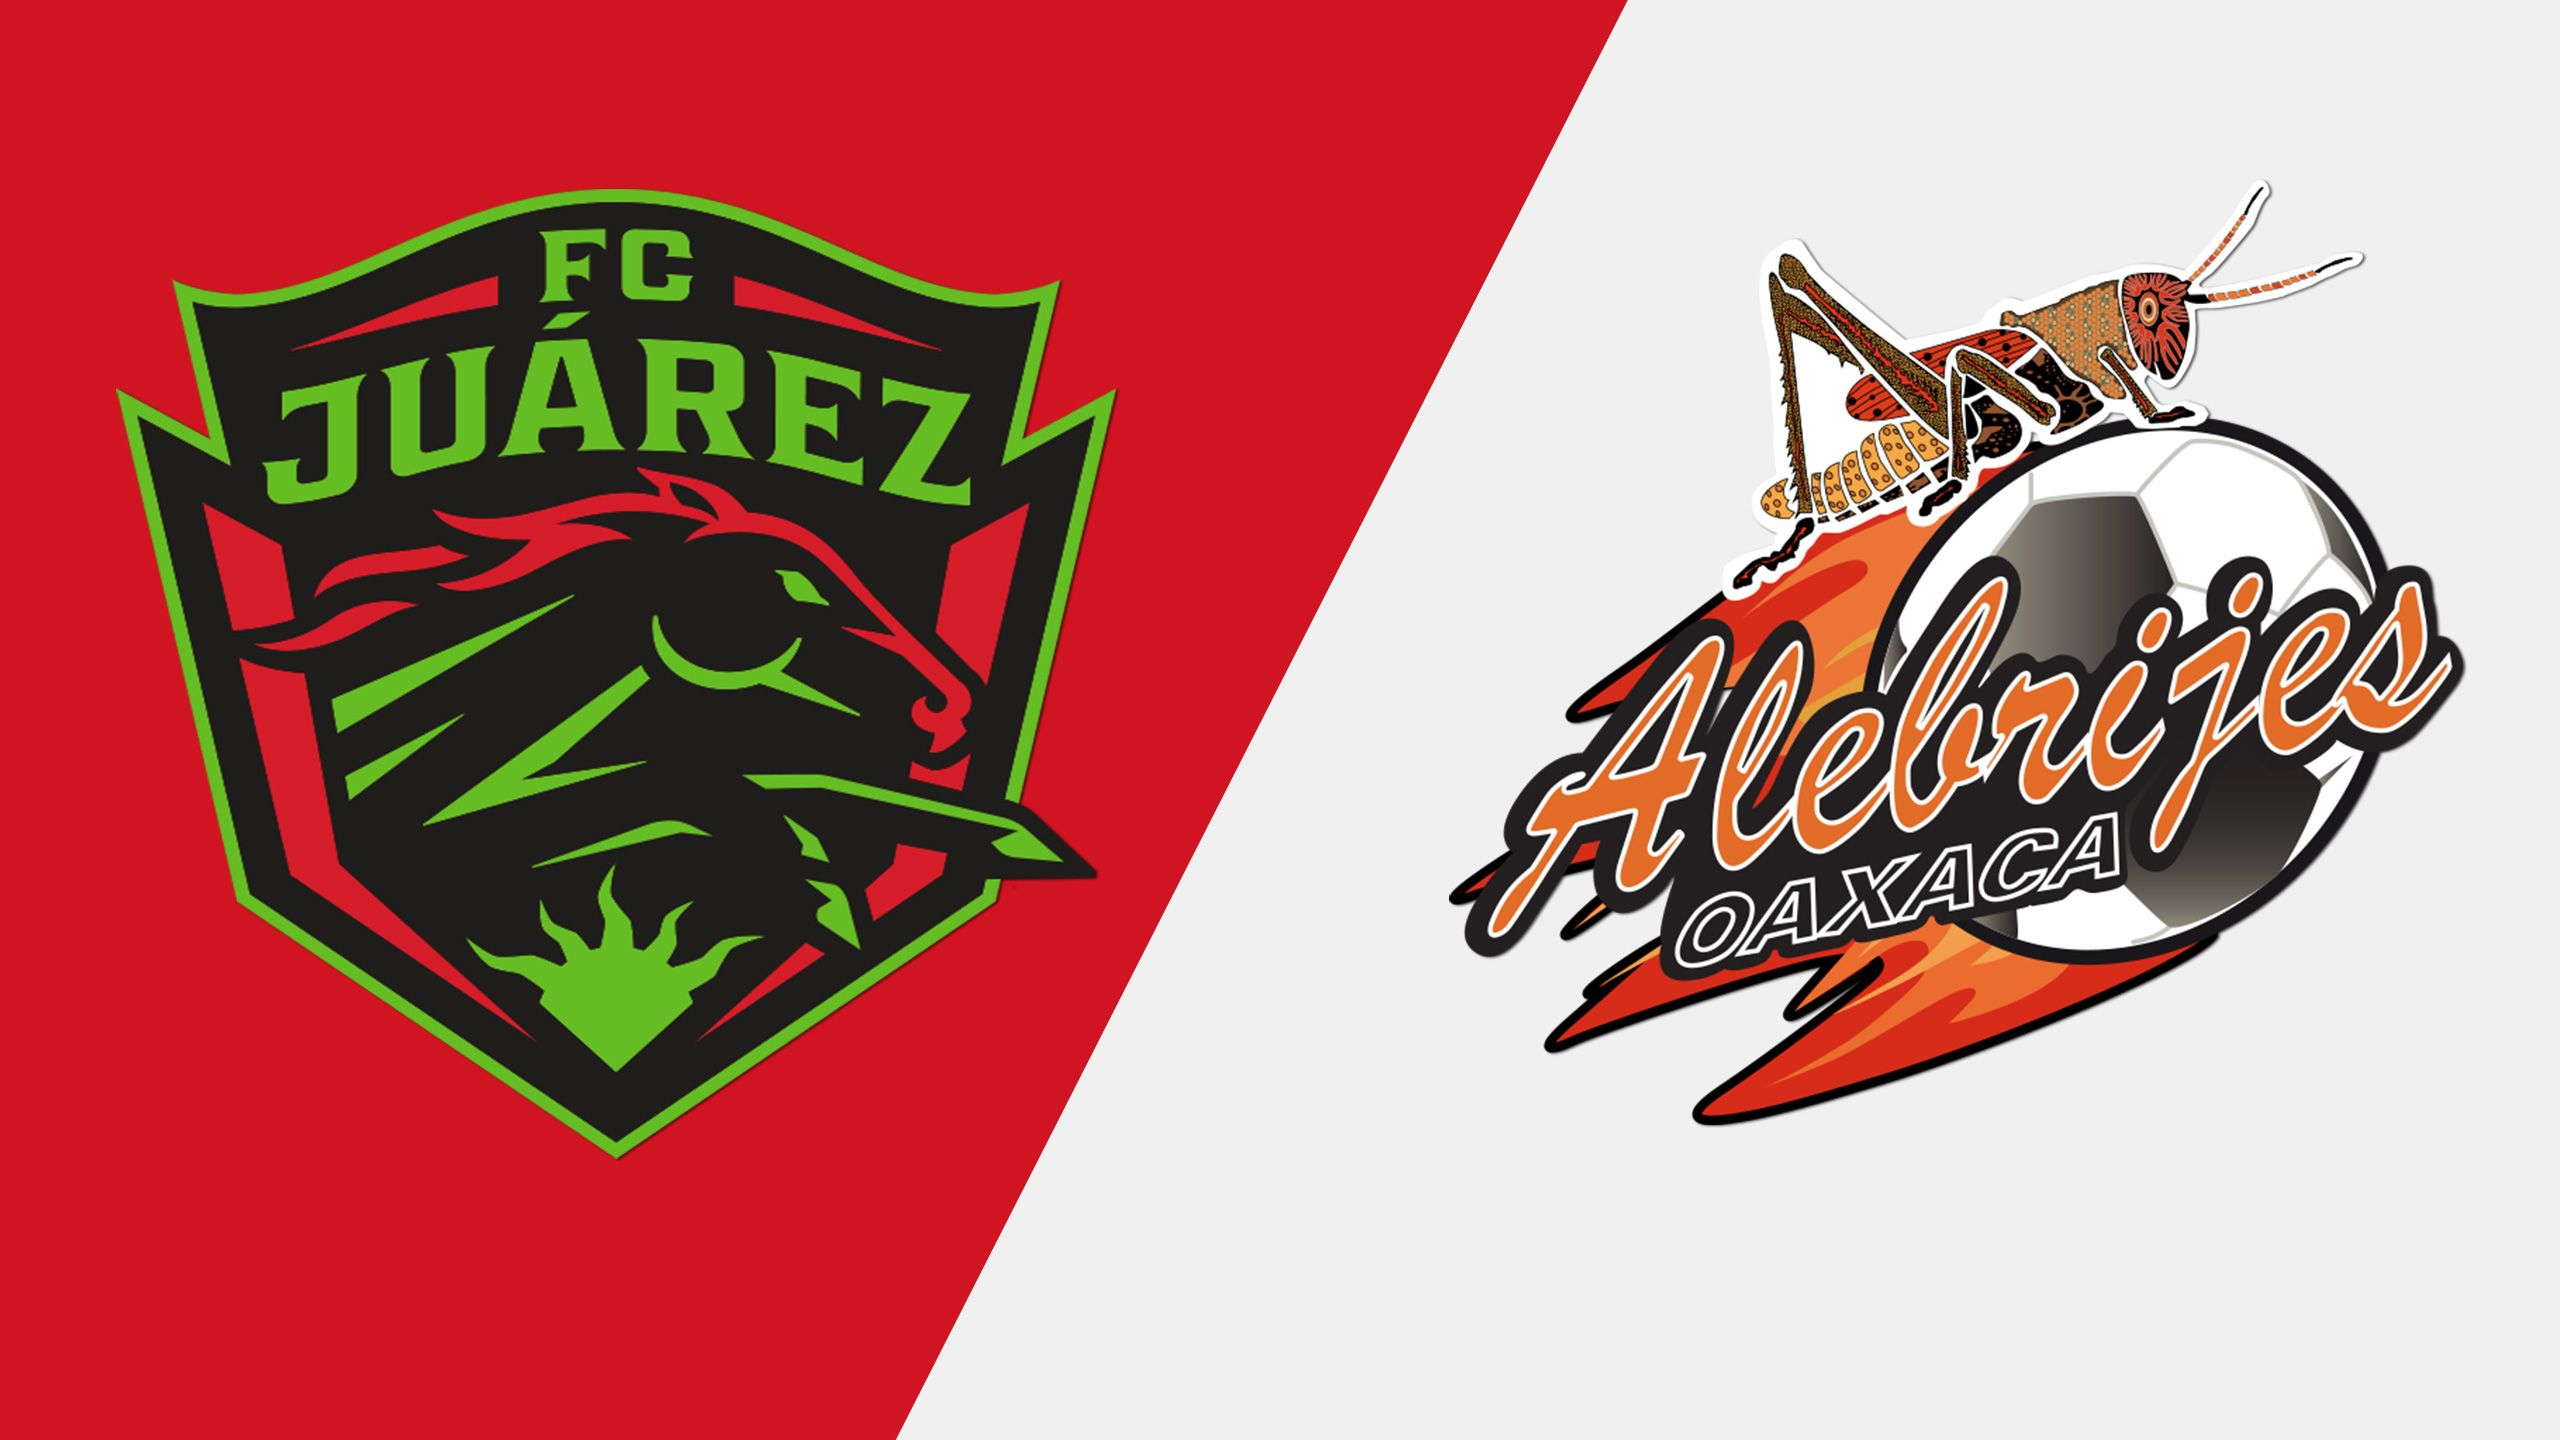 In Spanish - FC Juárez vs. Alebrijes de Oaxaca (Jornada 1) (Liga Bancomer)